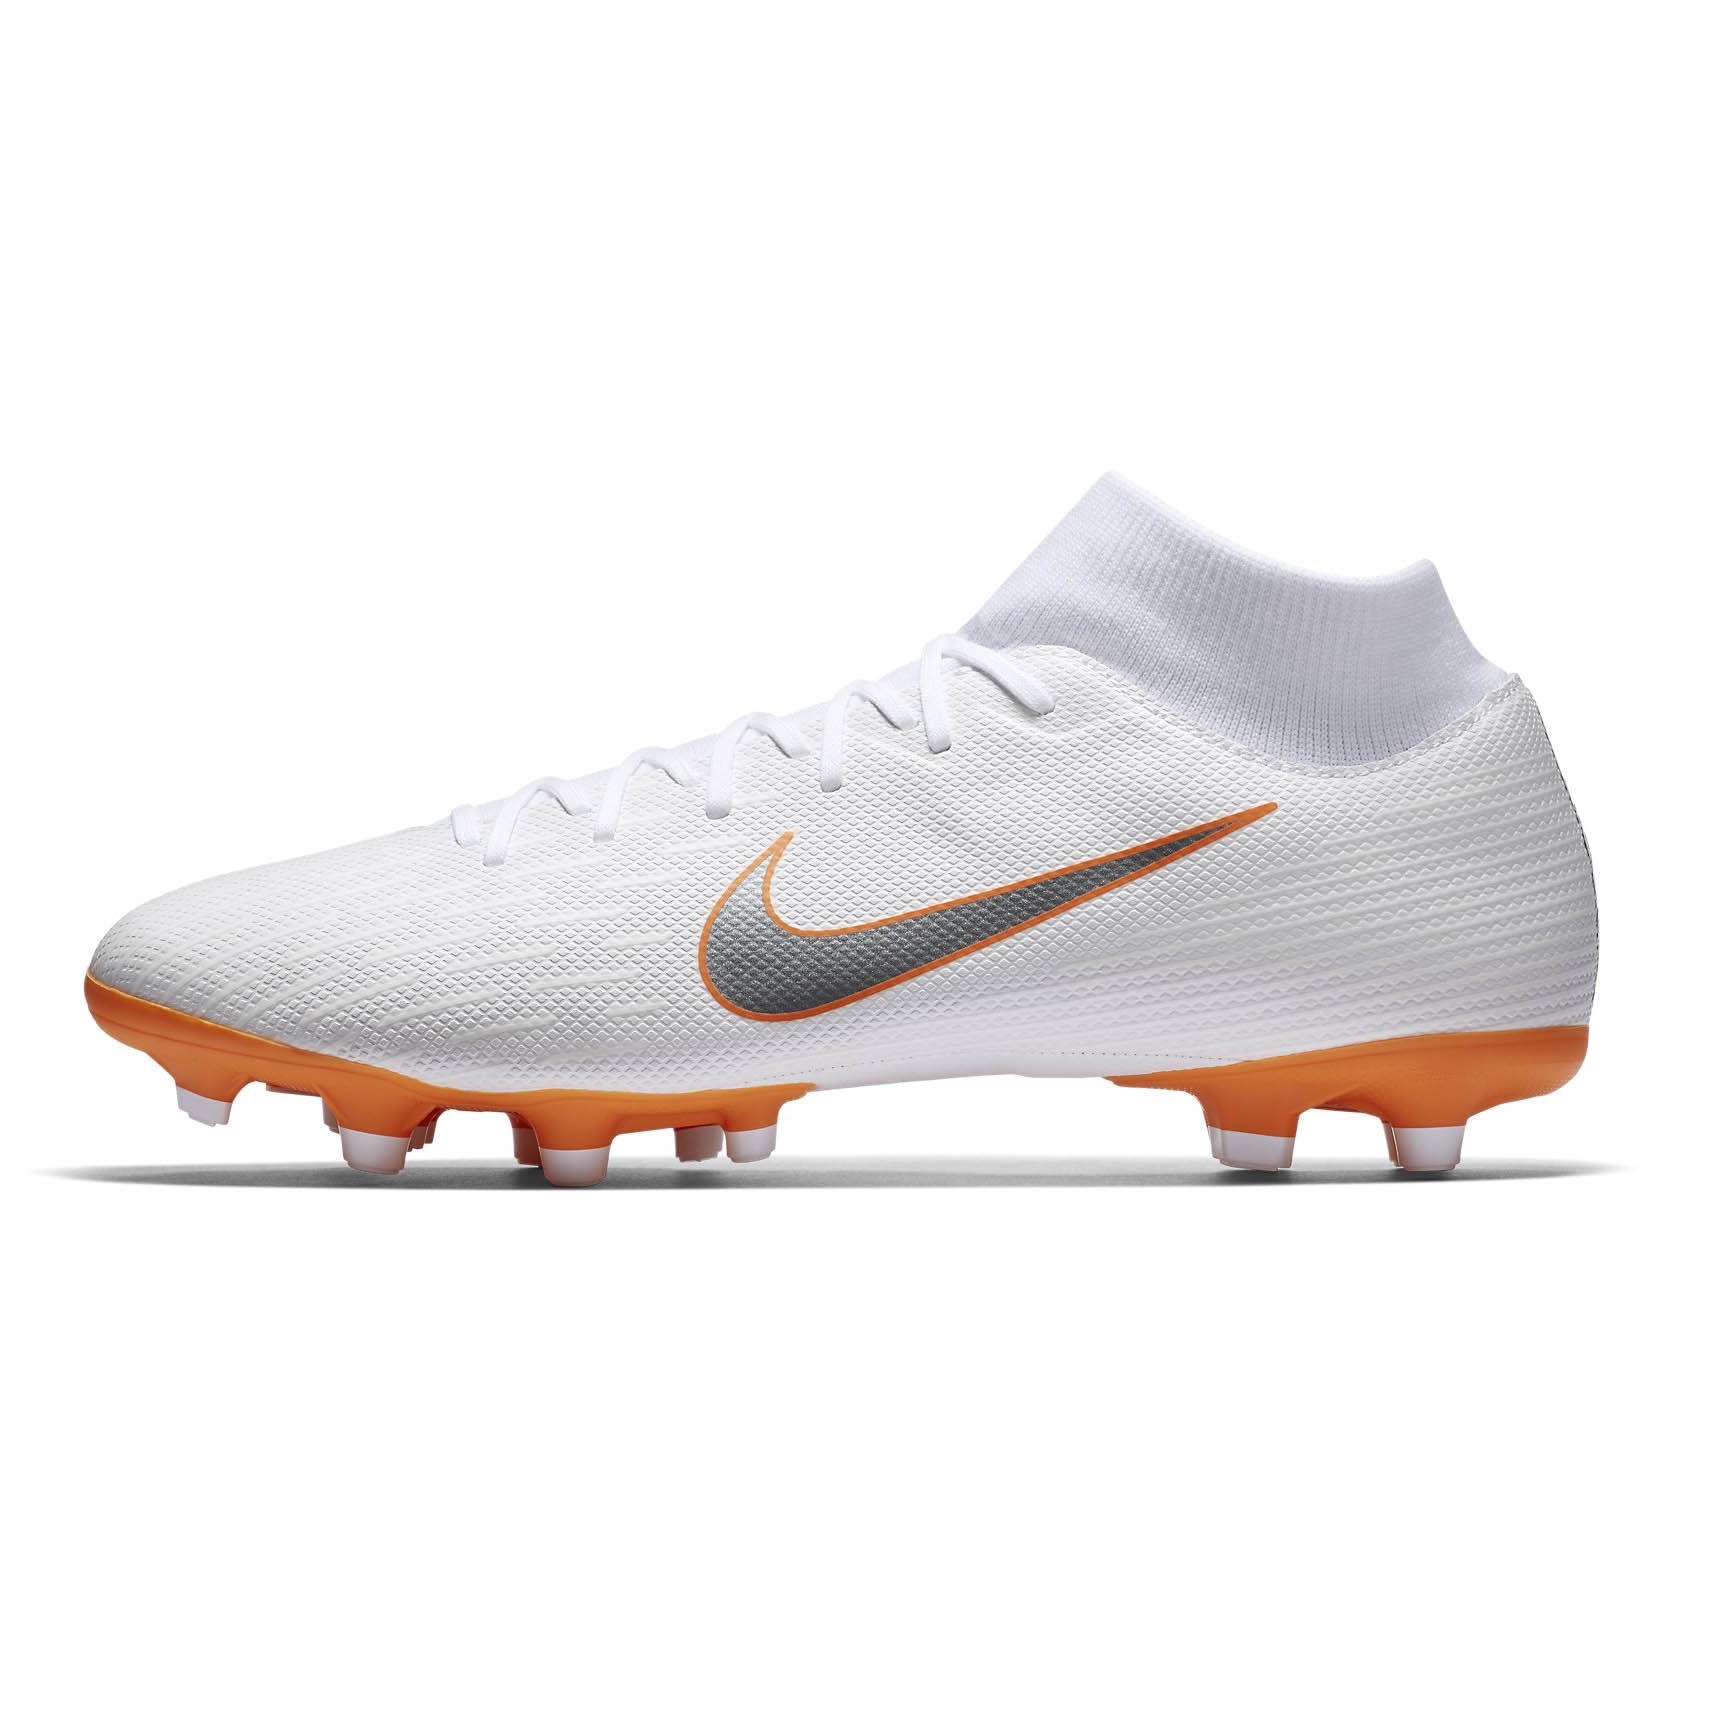 nike 2018 calcio scarpe